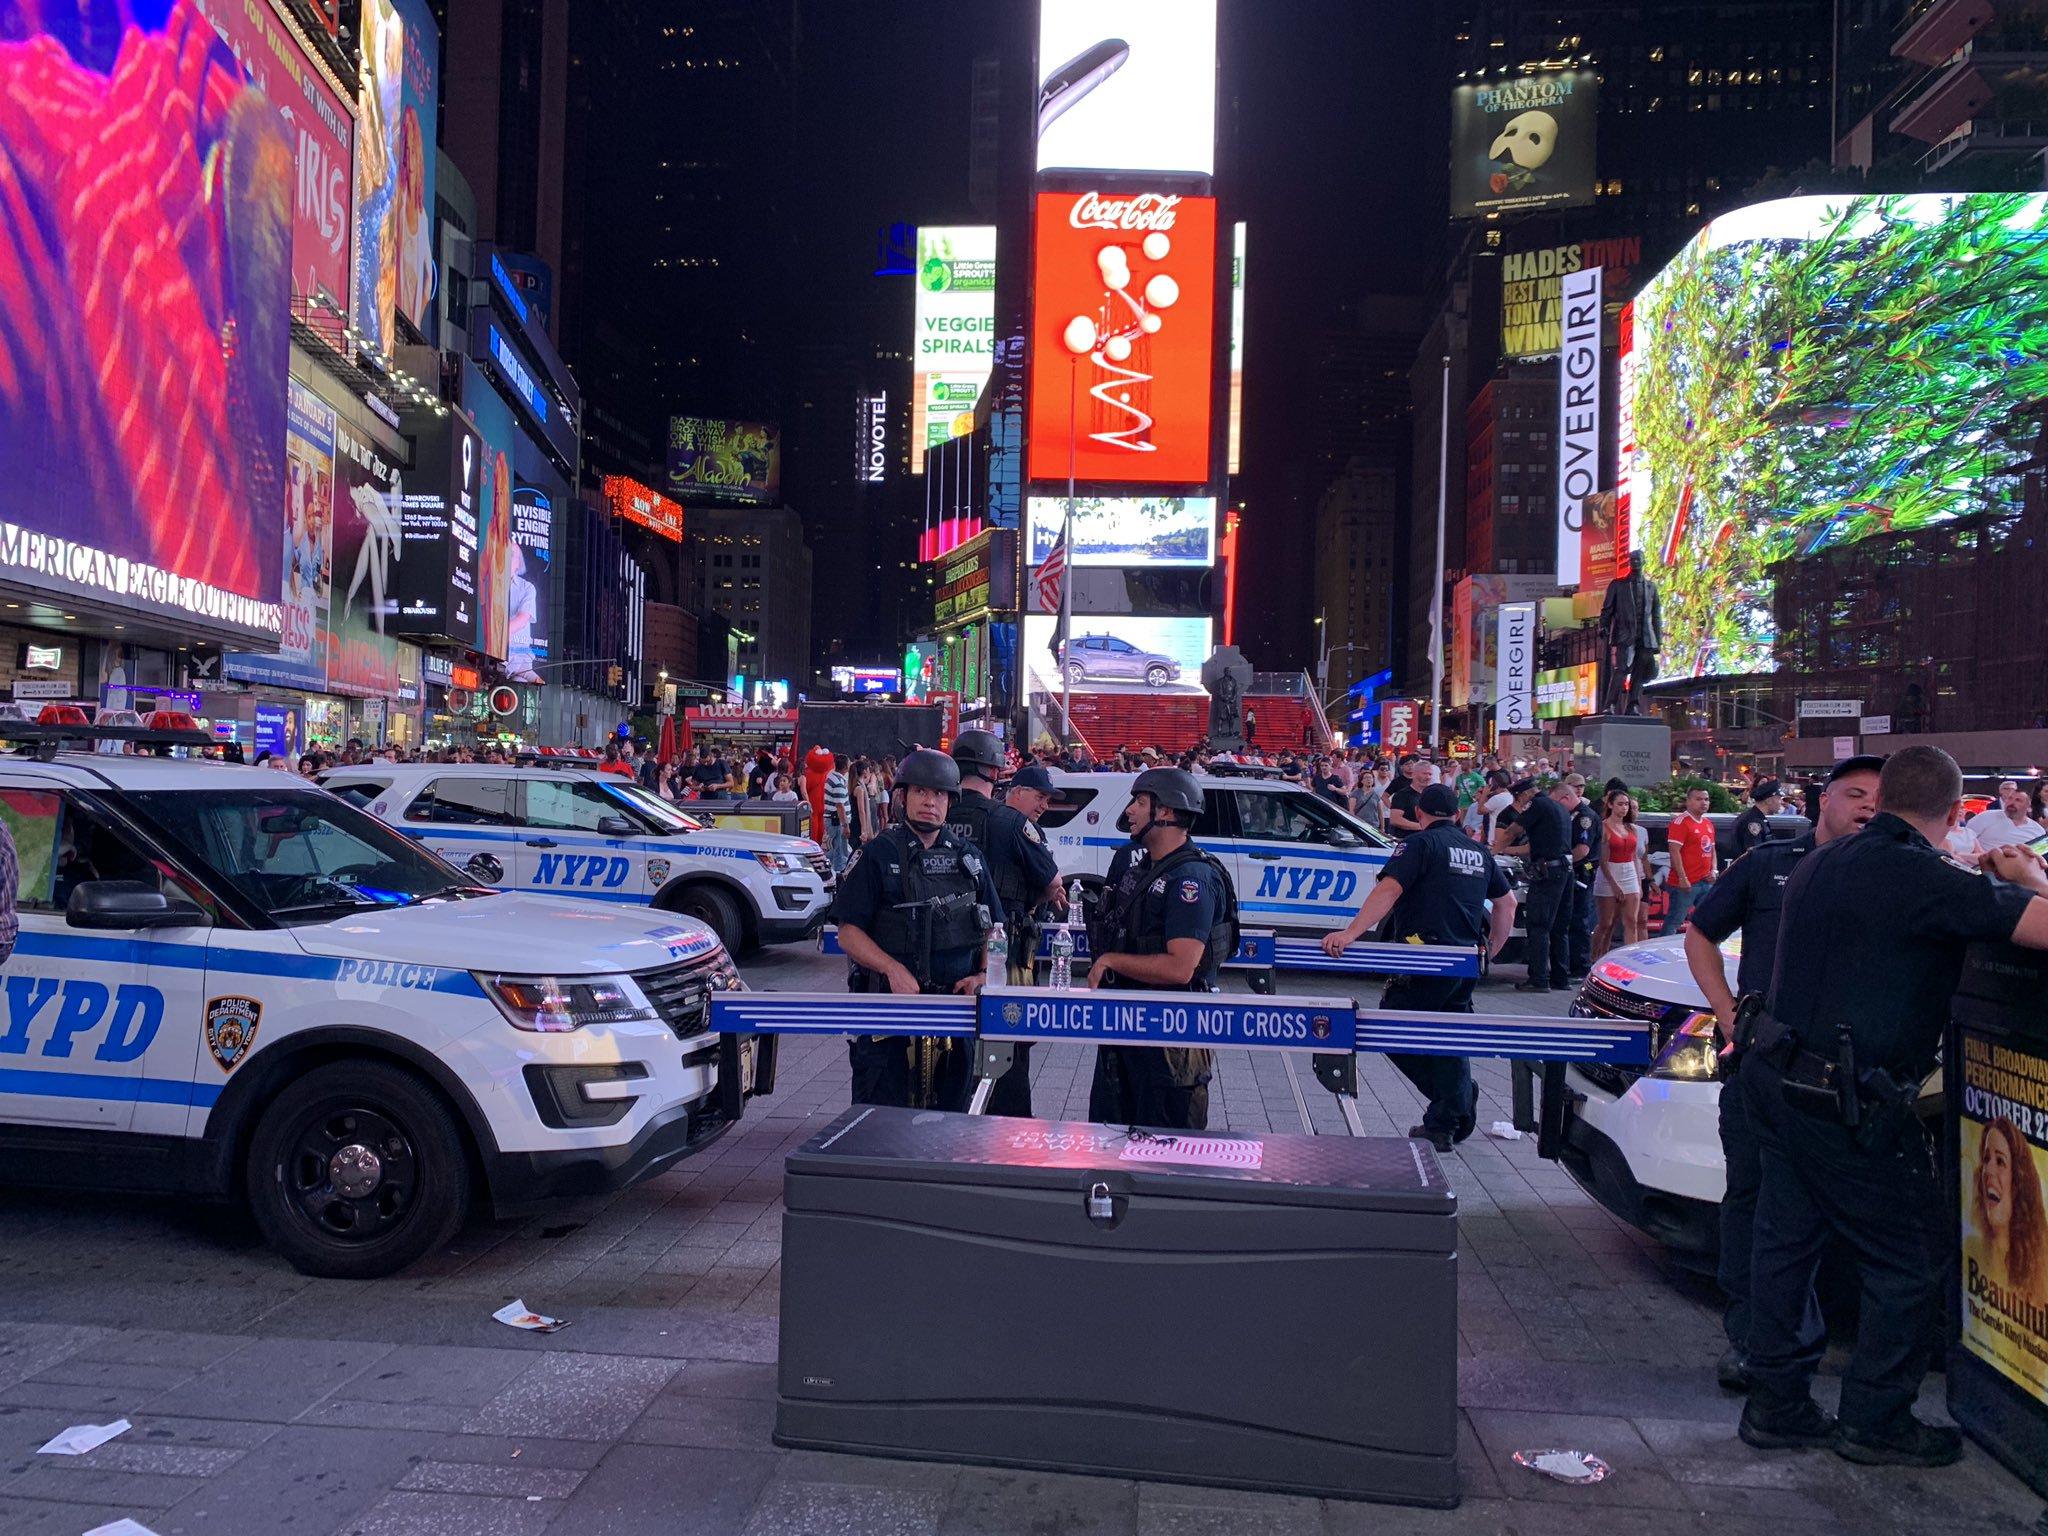 Falsa alarma de tiroteo provoca estampida en Times Square